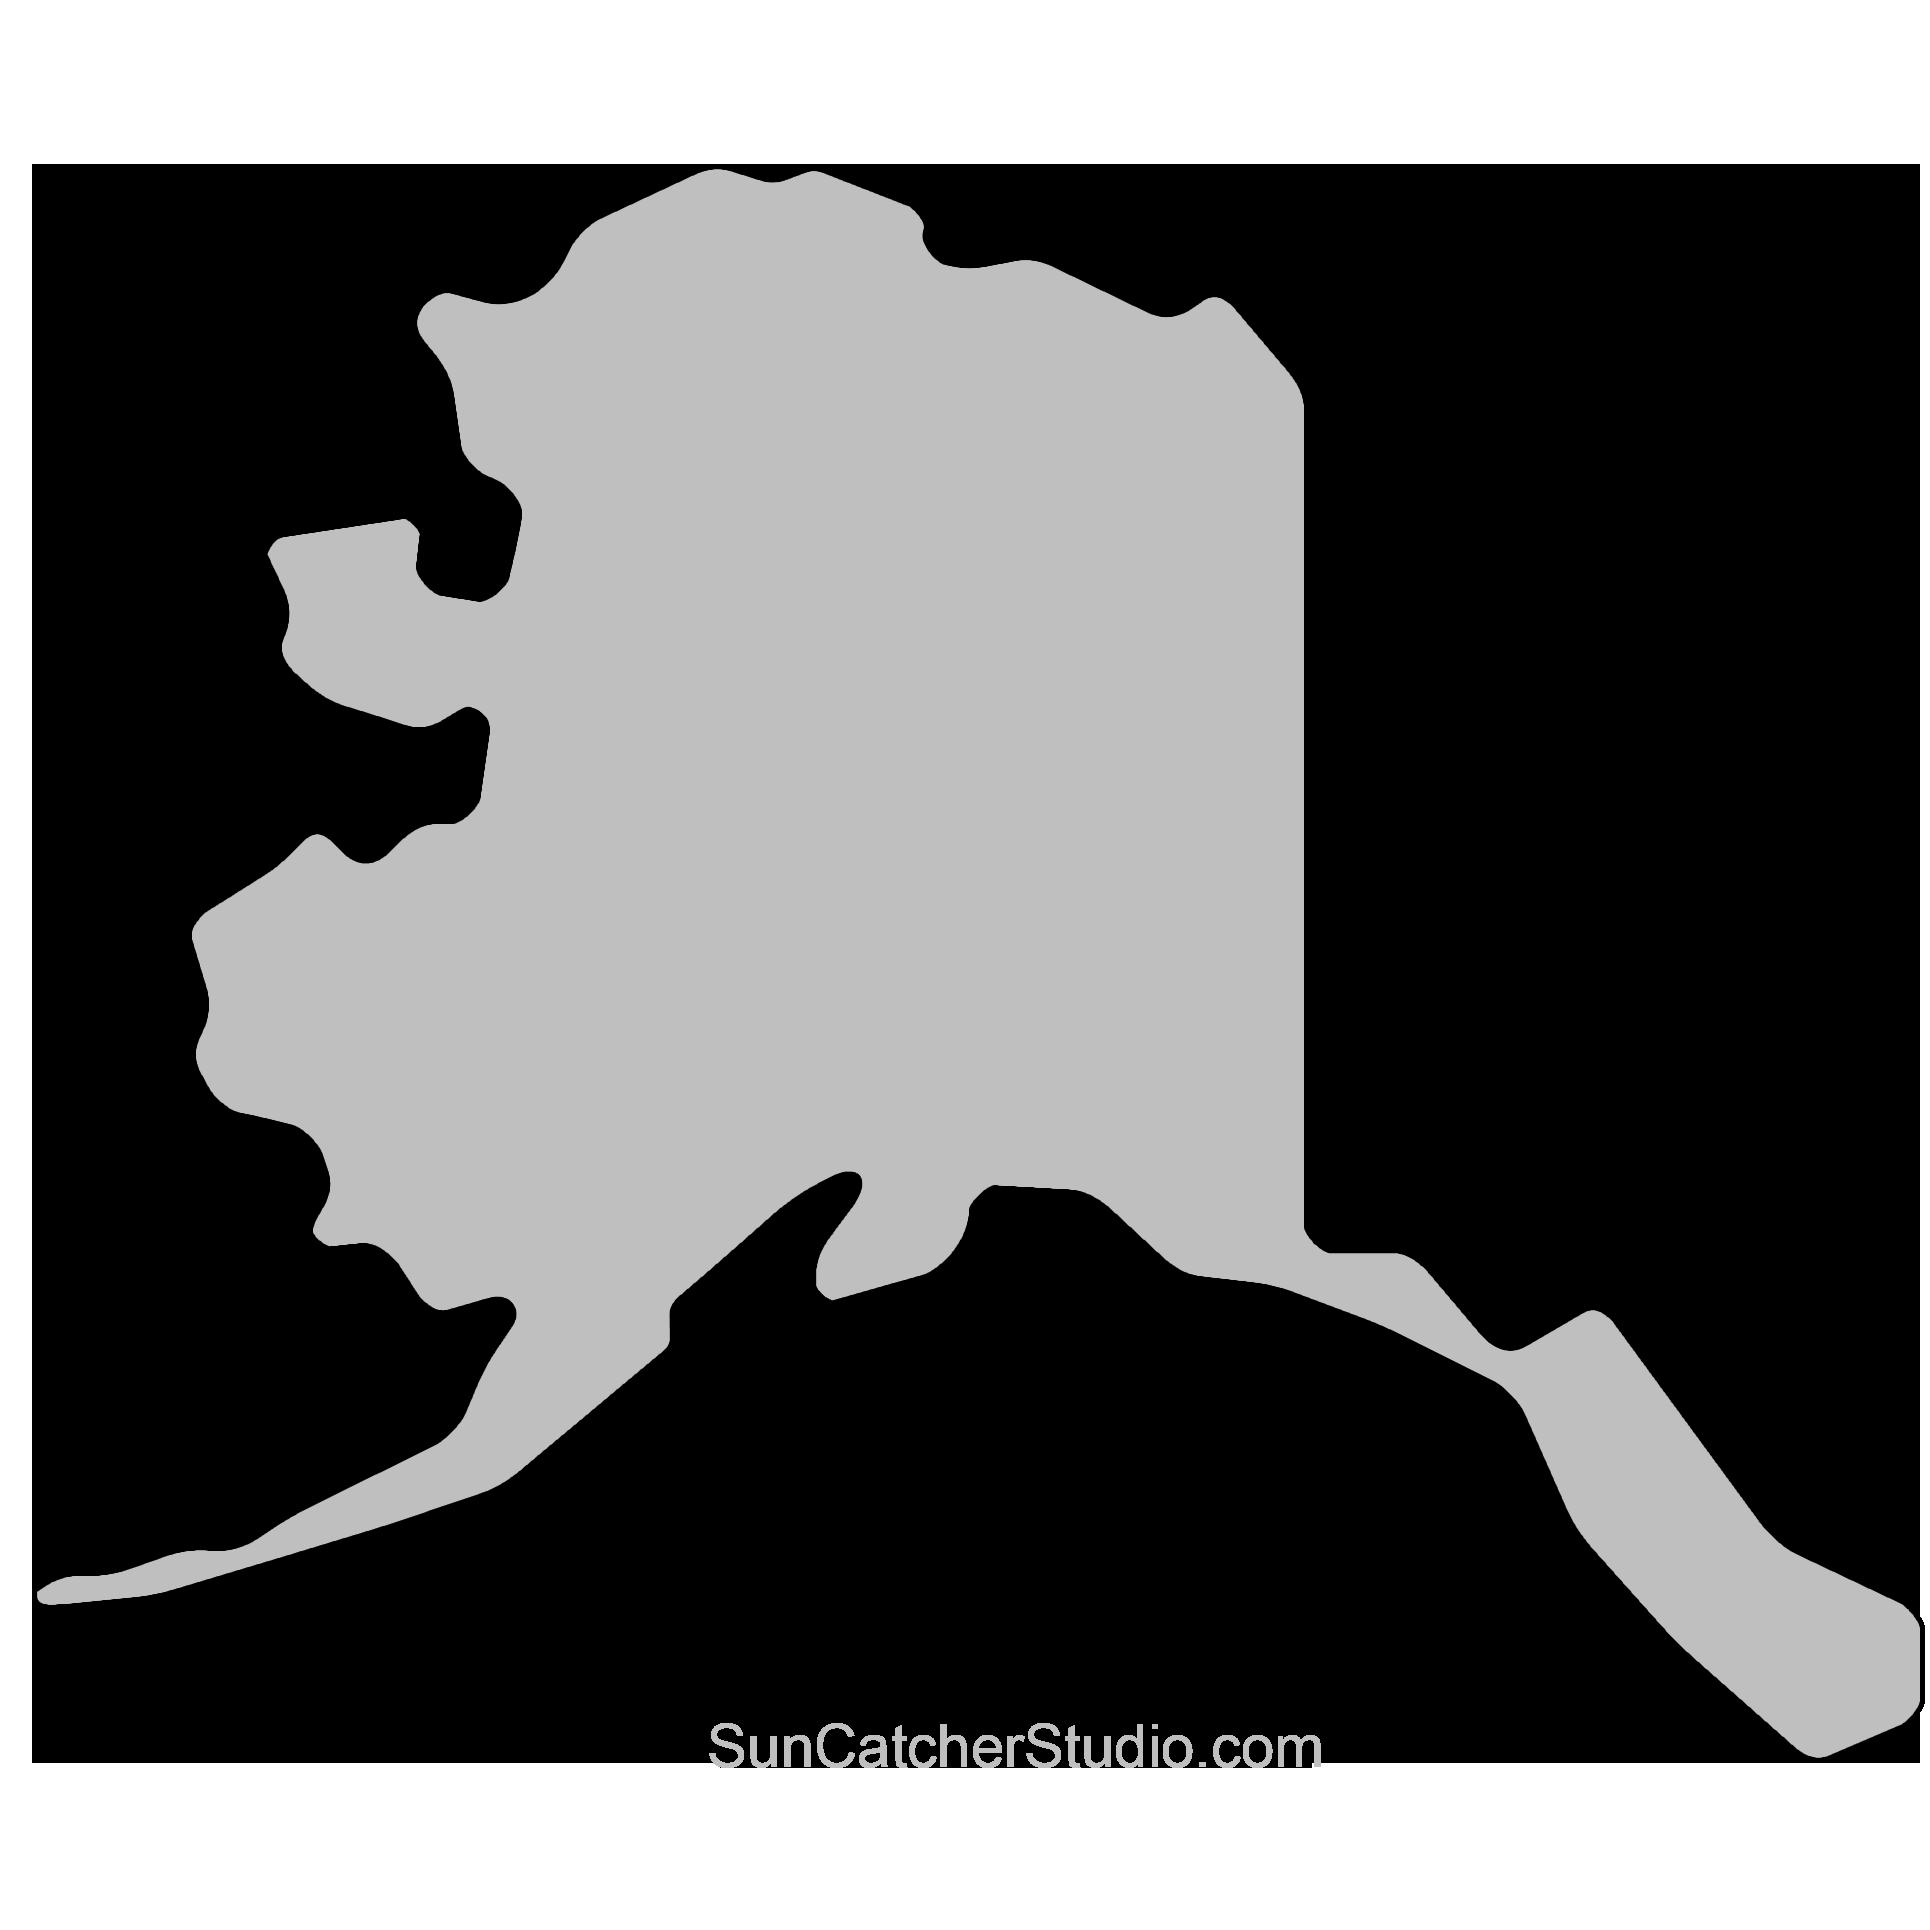 State outlines maps stencils. Alaska clipart shape